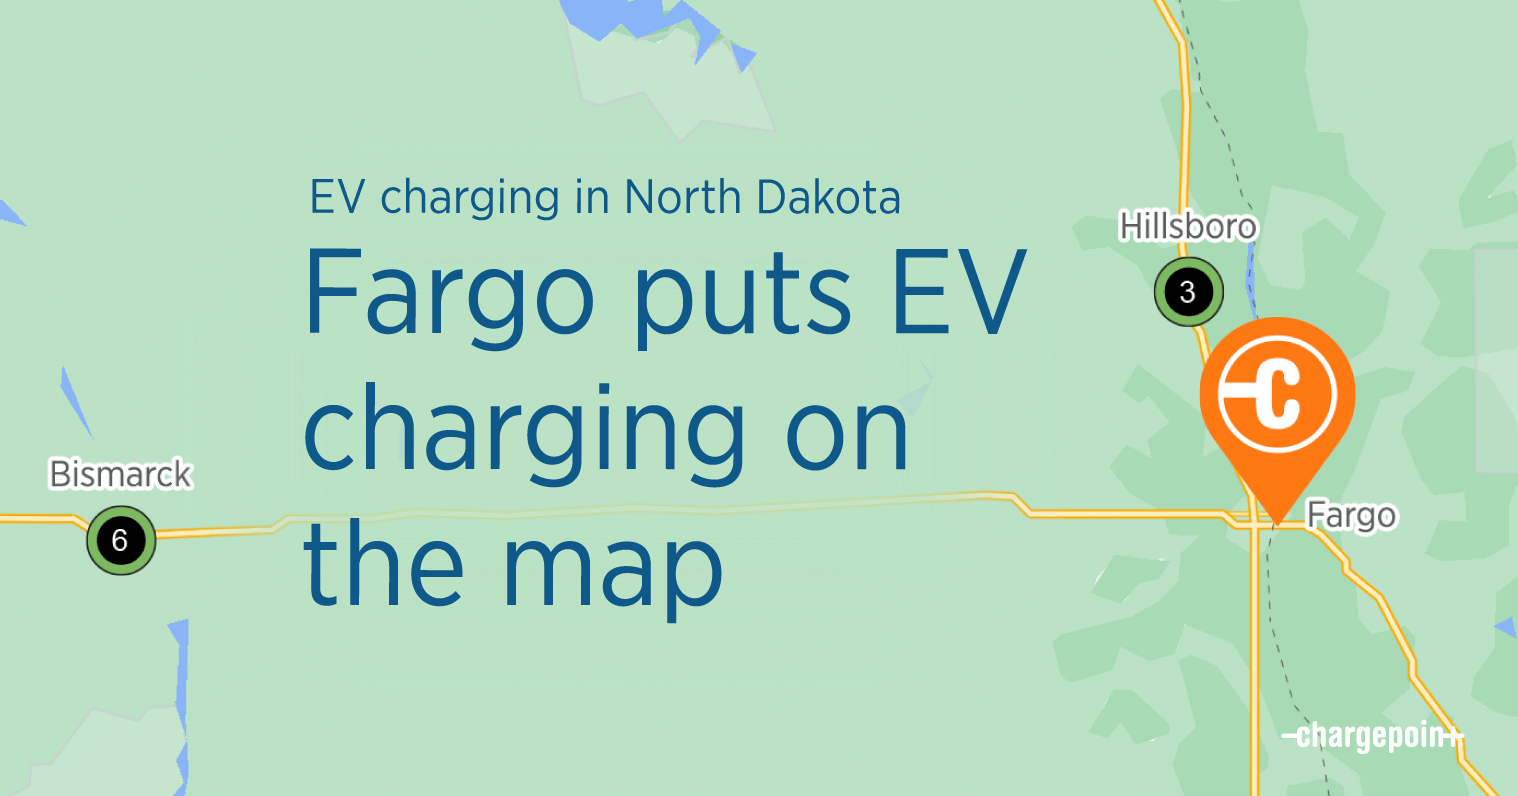 EV charging in Fargo, North Dakota banner